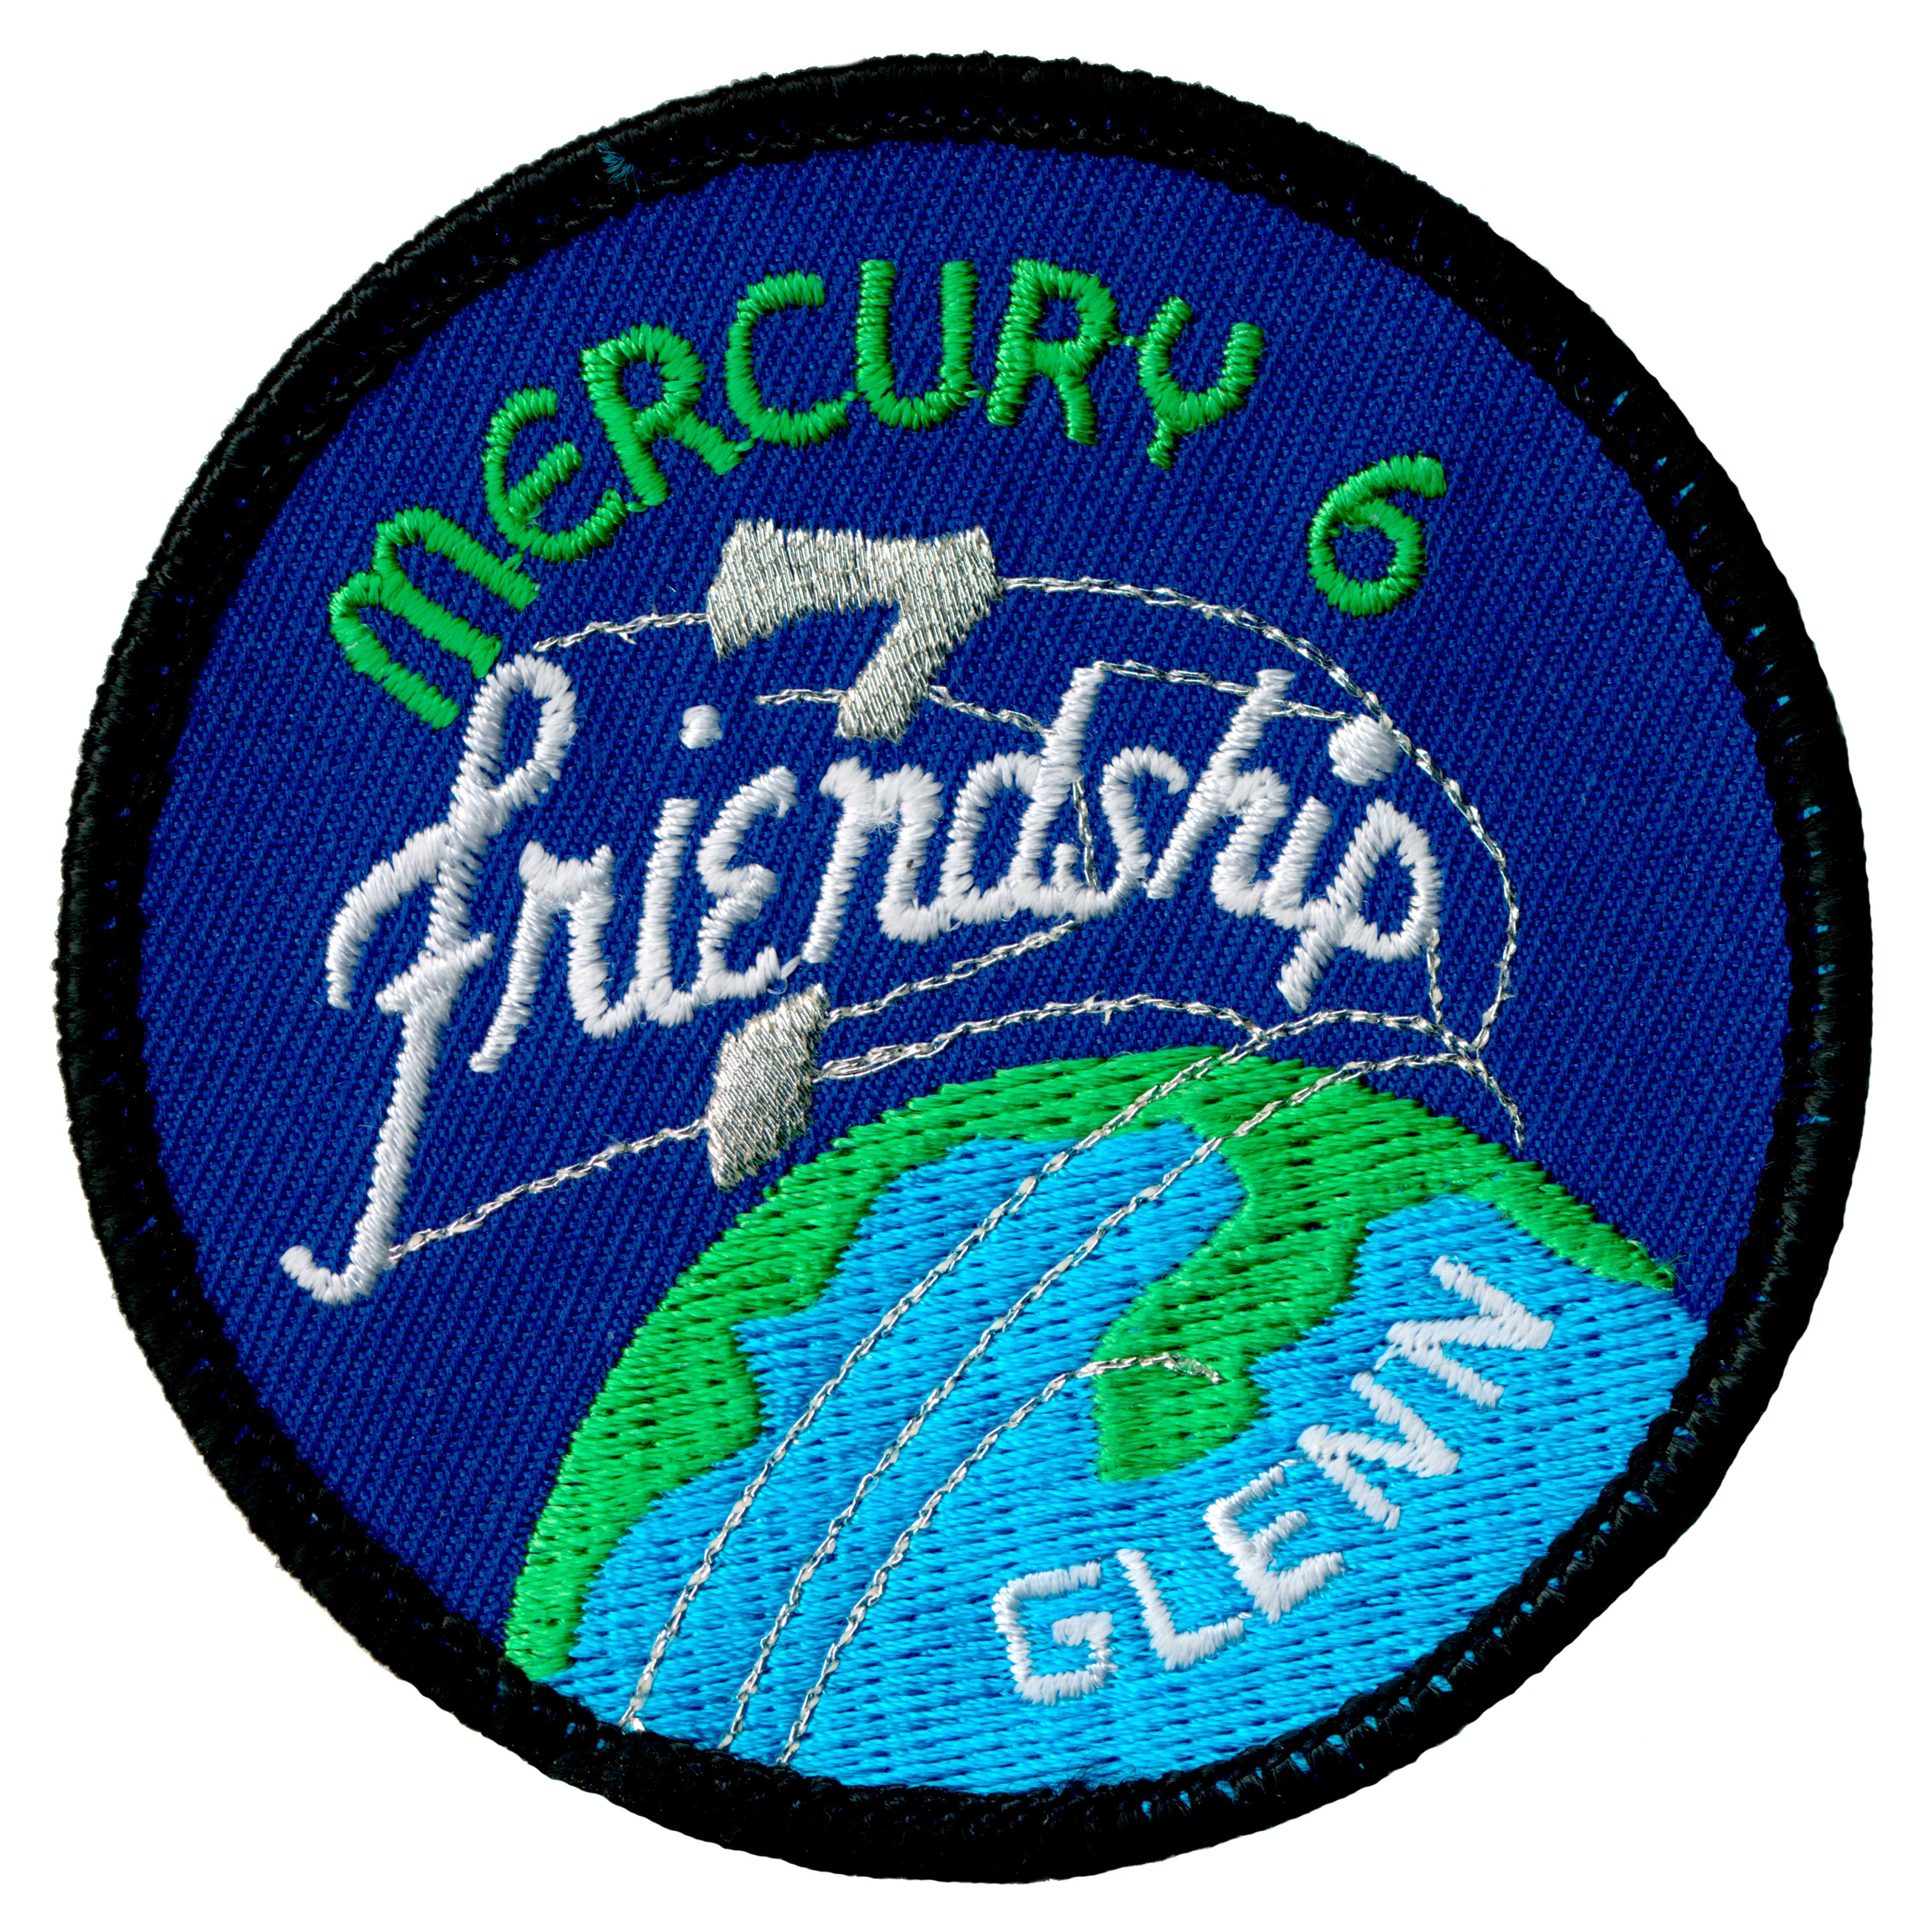 mercury 7 mission - photo #28